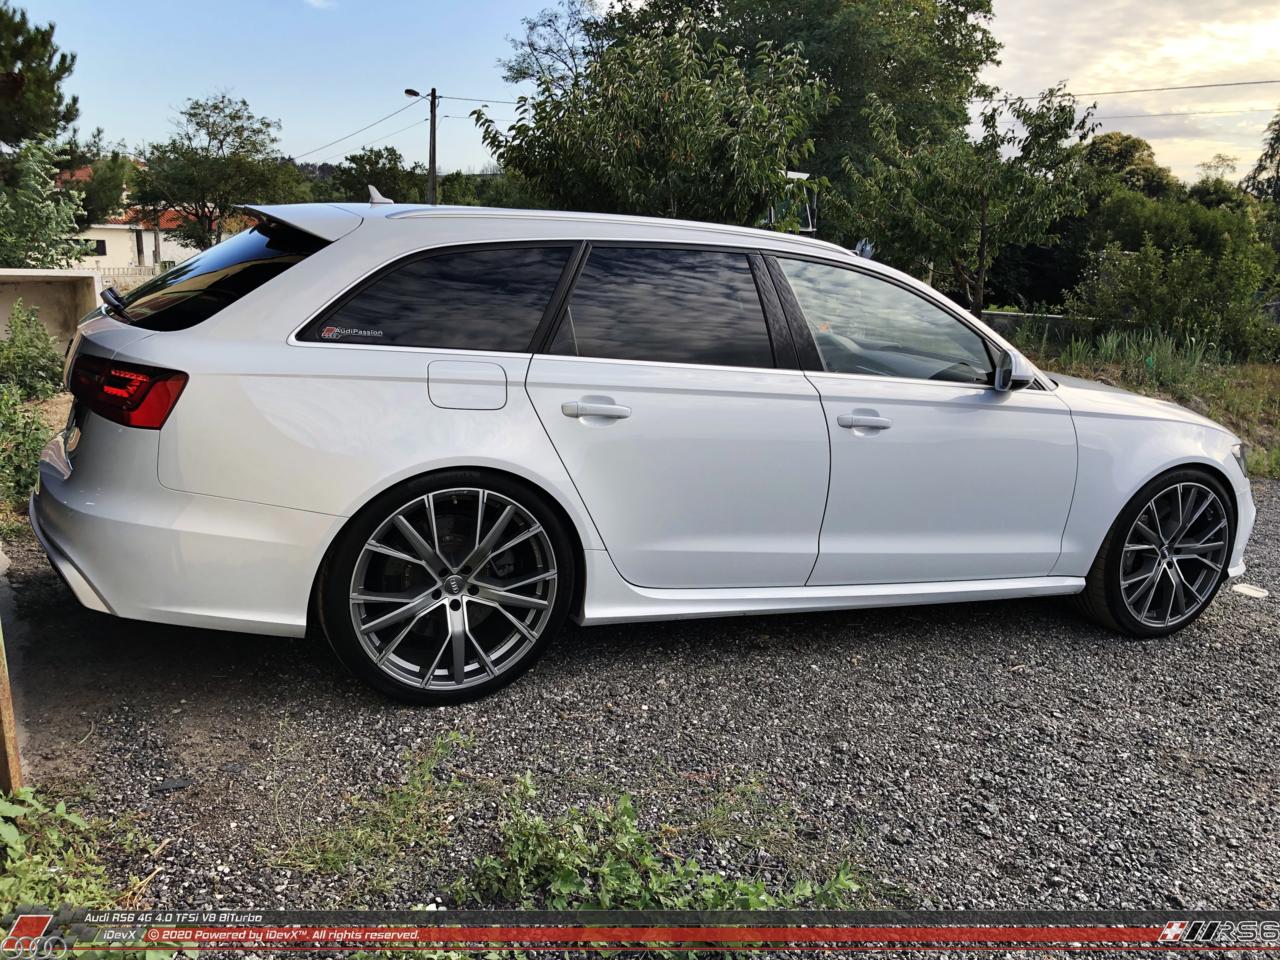 05_08.2019_Audi-RS6_iDevX_055.png